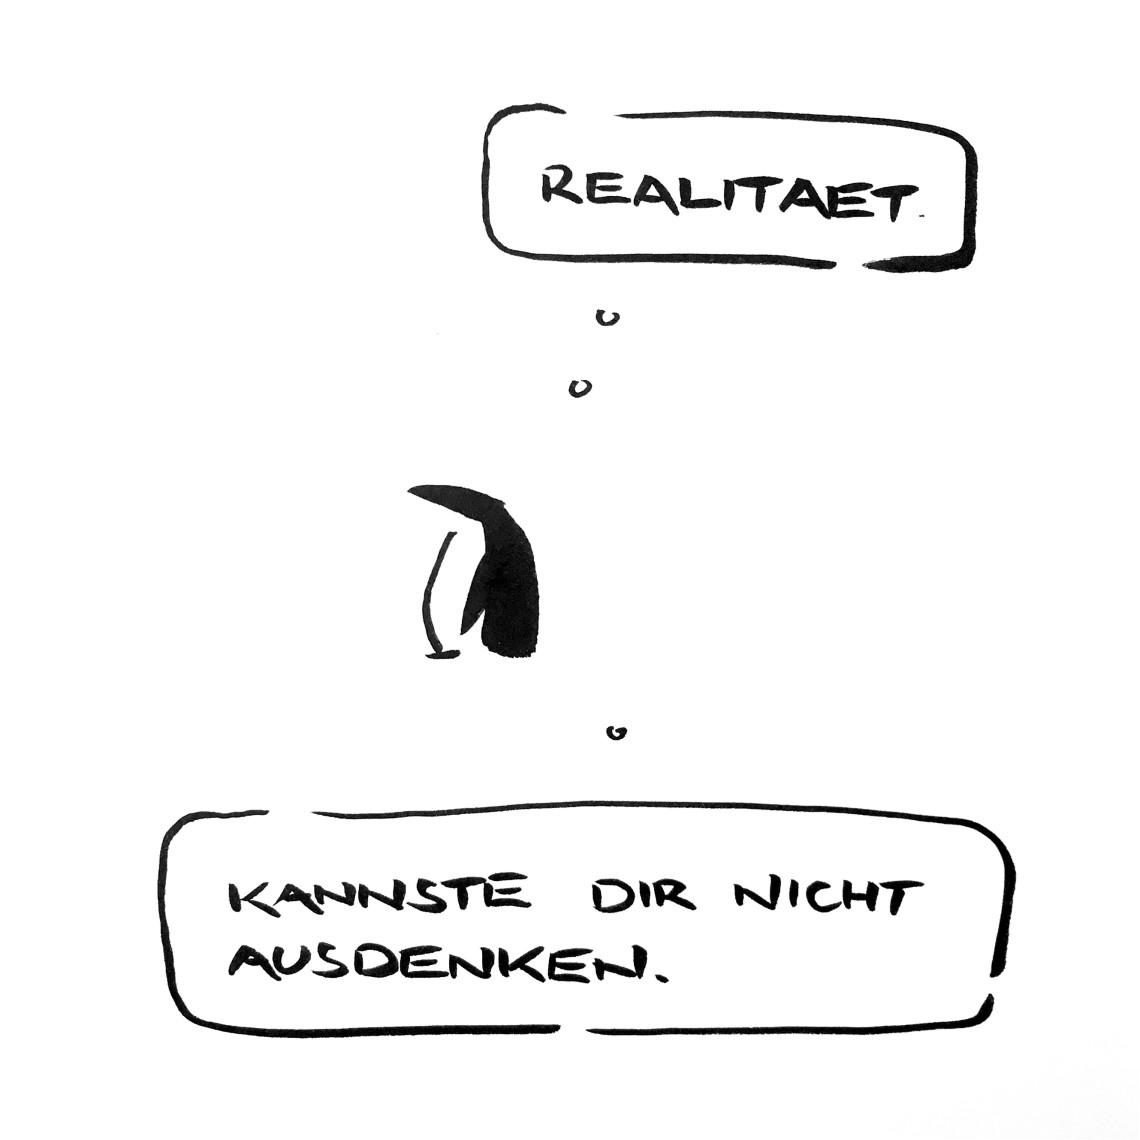 16_036_realitaet